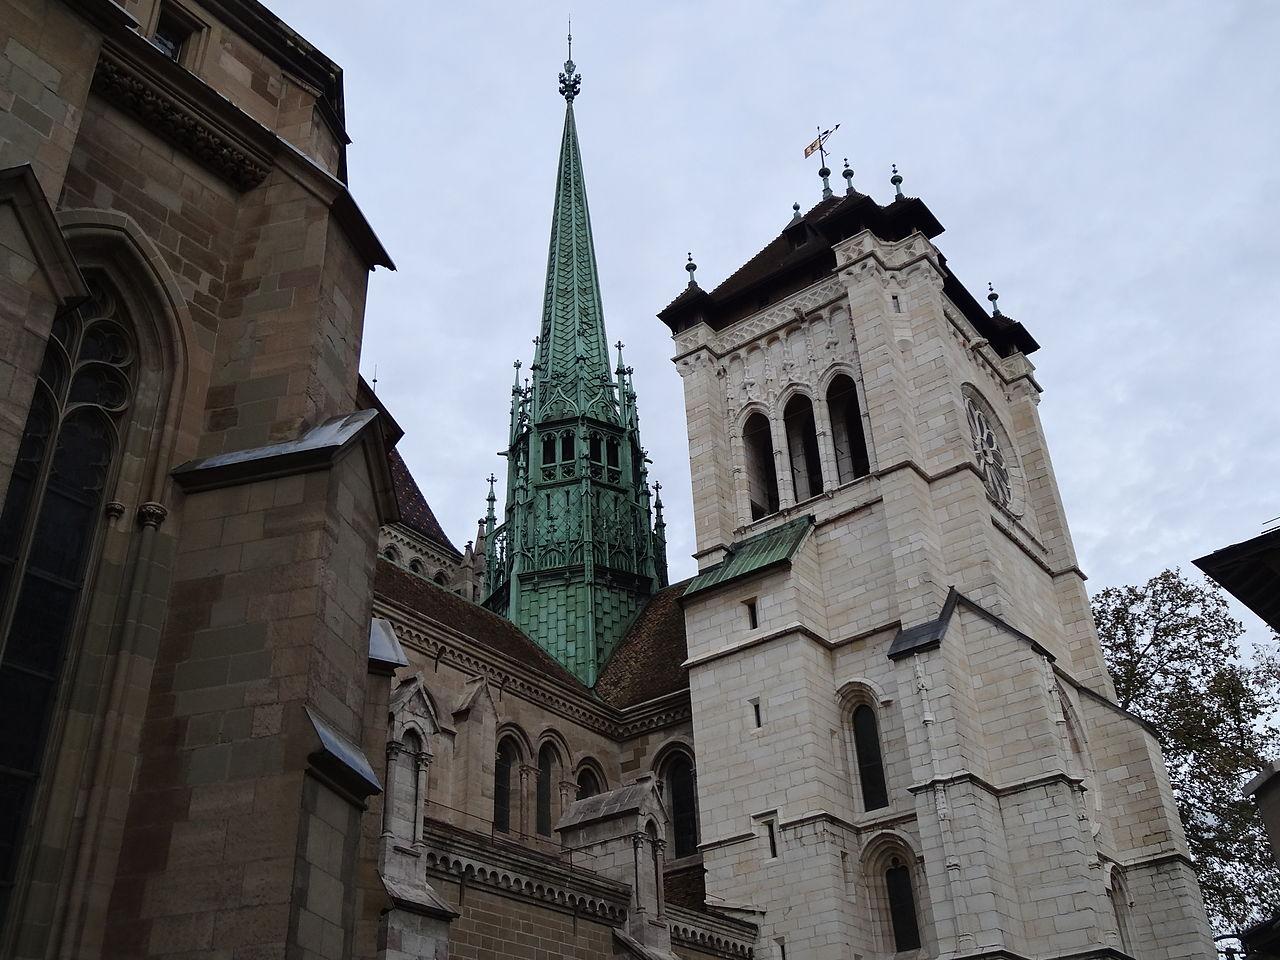 Bild Kathedrale St. Peter Genf